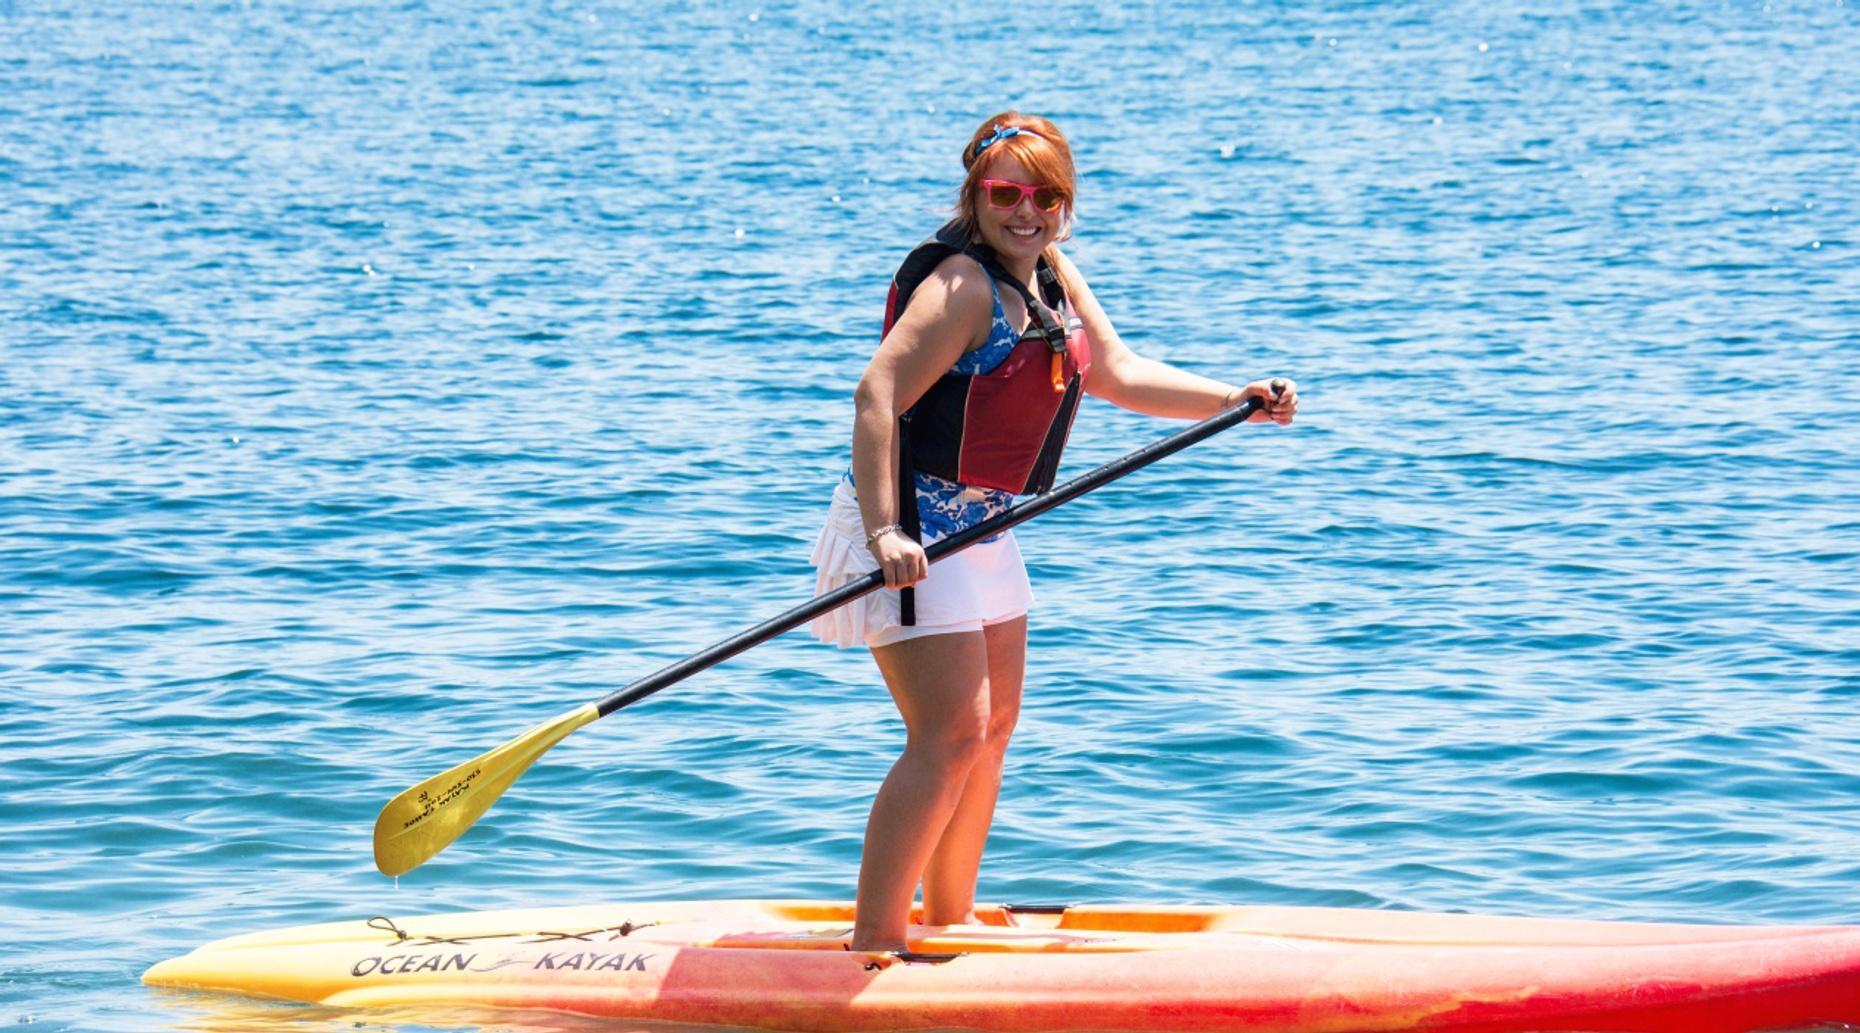 Singer Island Sandbar Paddle Boarding Tour